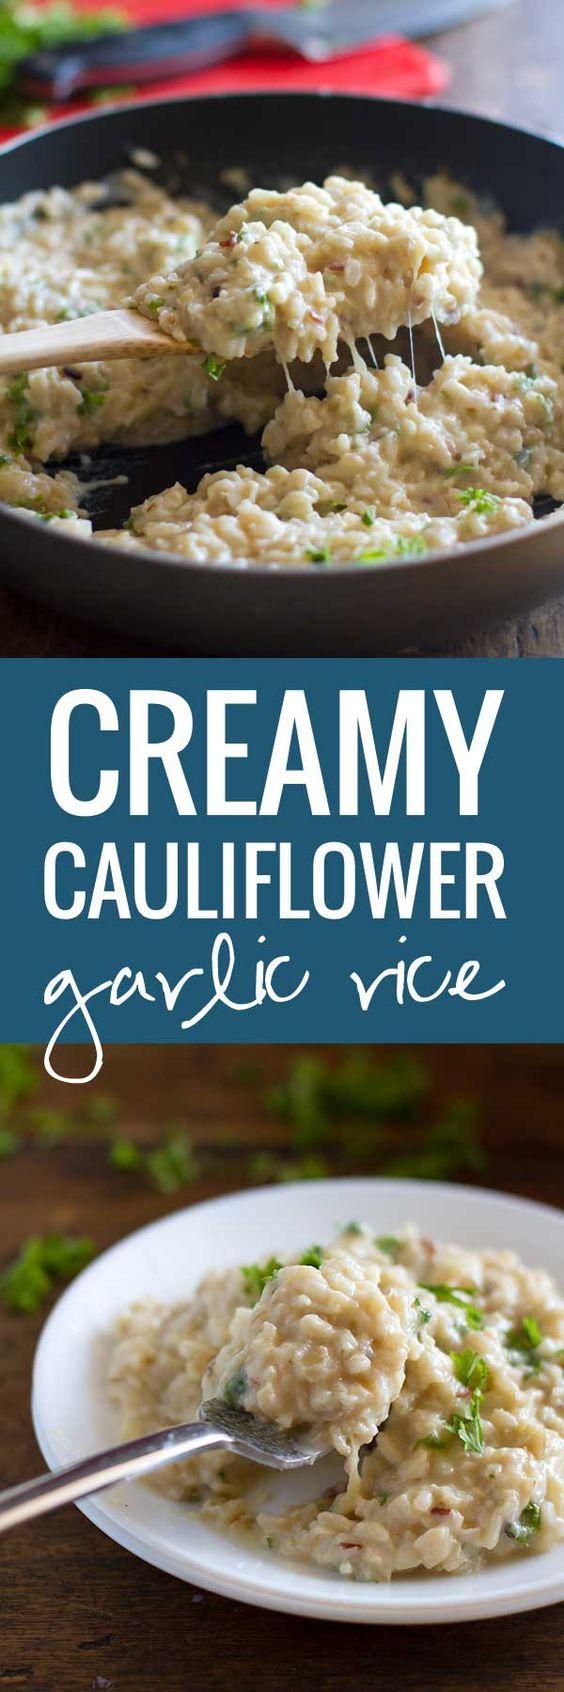 growing cauliflower cauliflower recipes cauliflower rice healthy ...